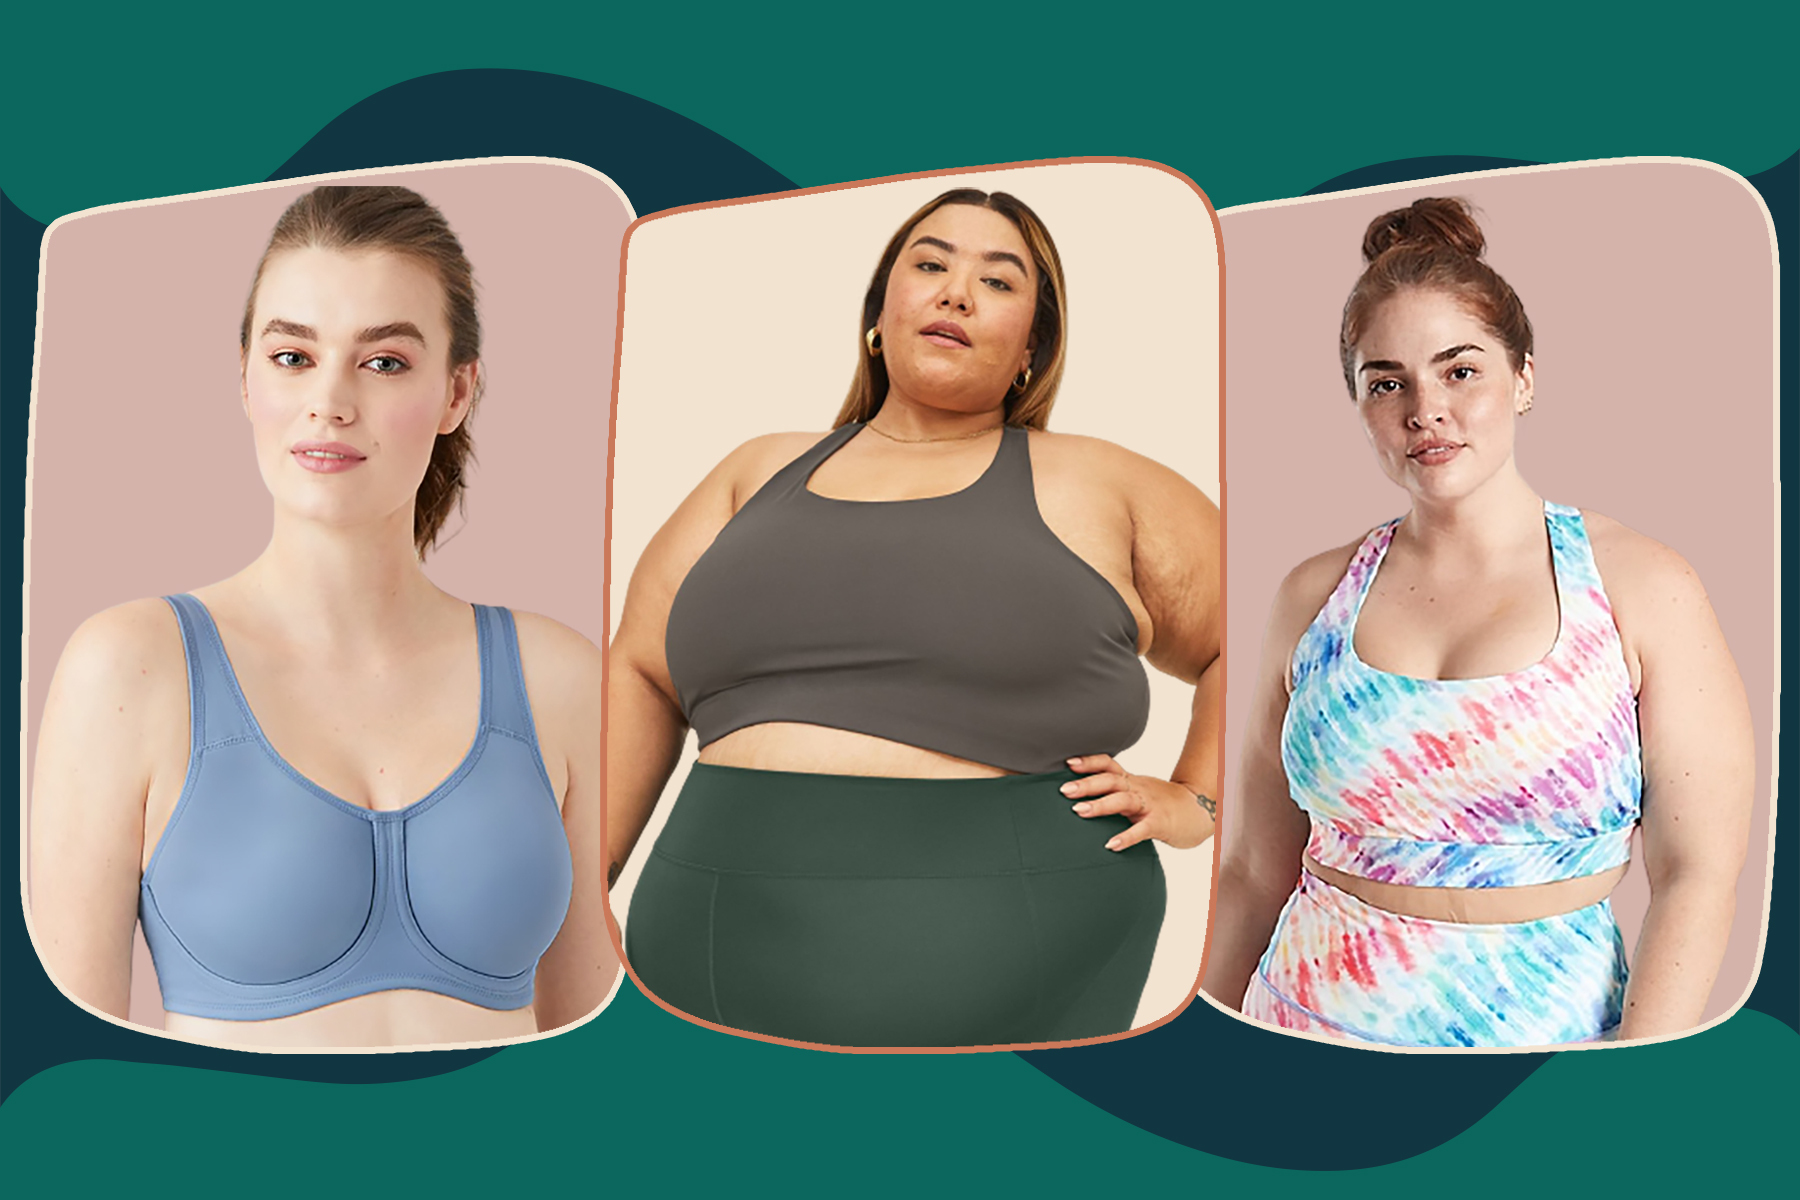 sport-bras-big-boobs